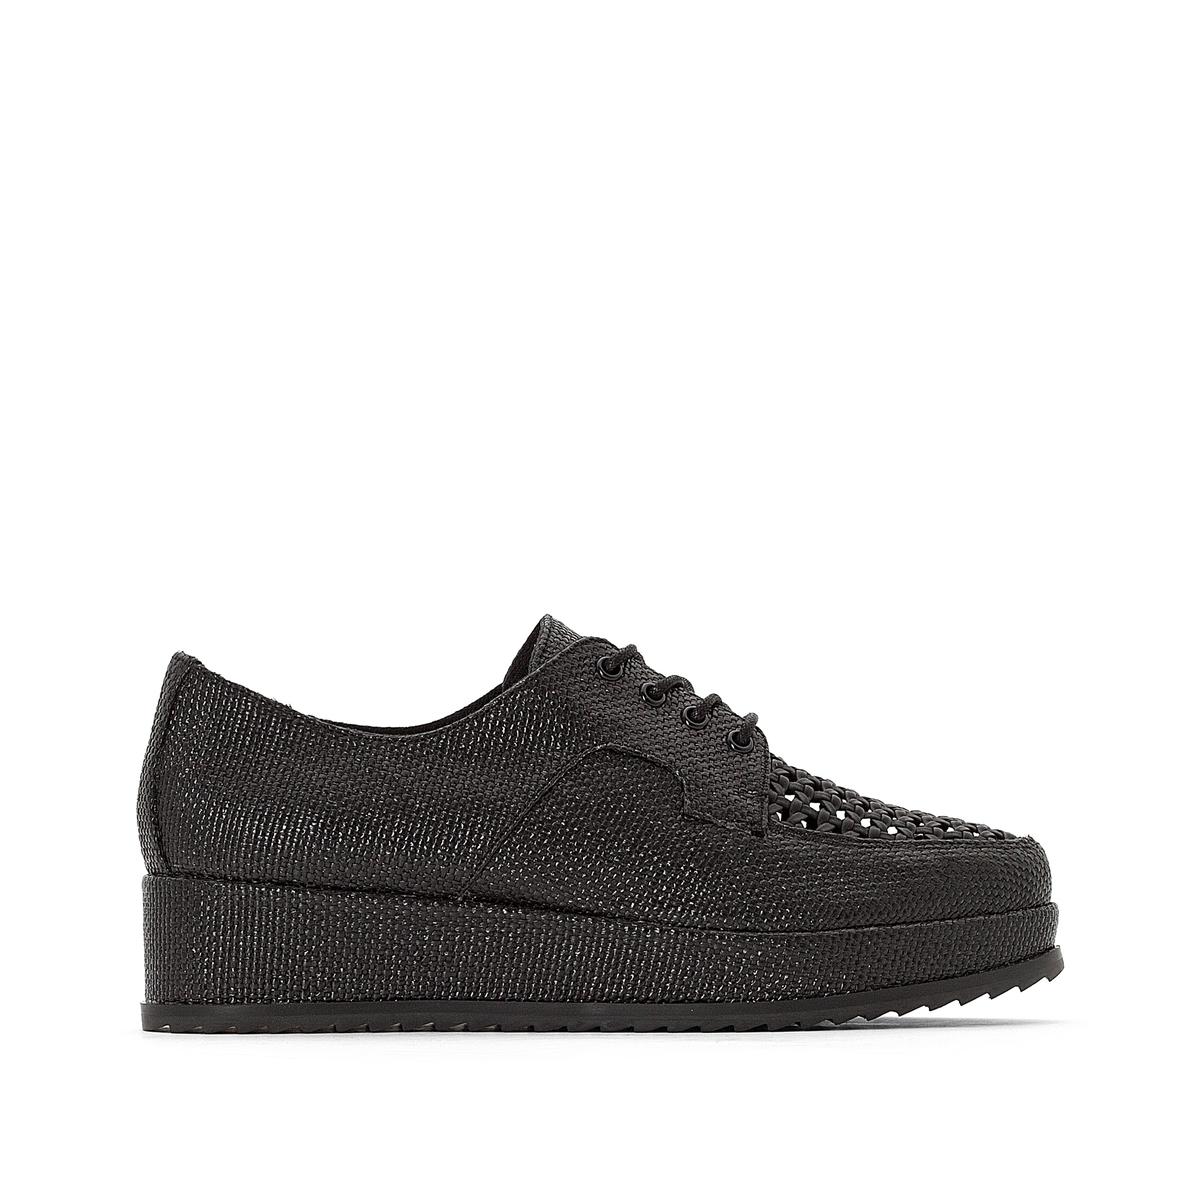 Ботинки-дерби La Redoute На шнуровке на платформе 41 черный ботинки la redoute на шнуровке 38 белый